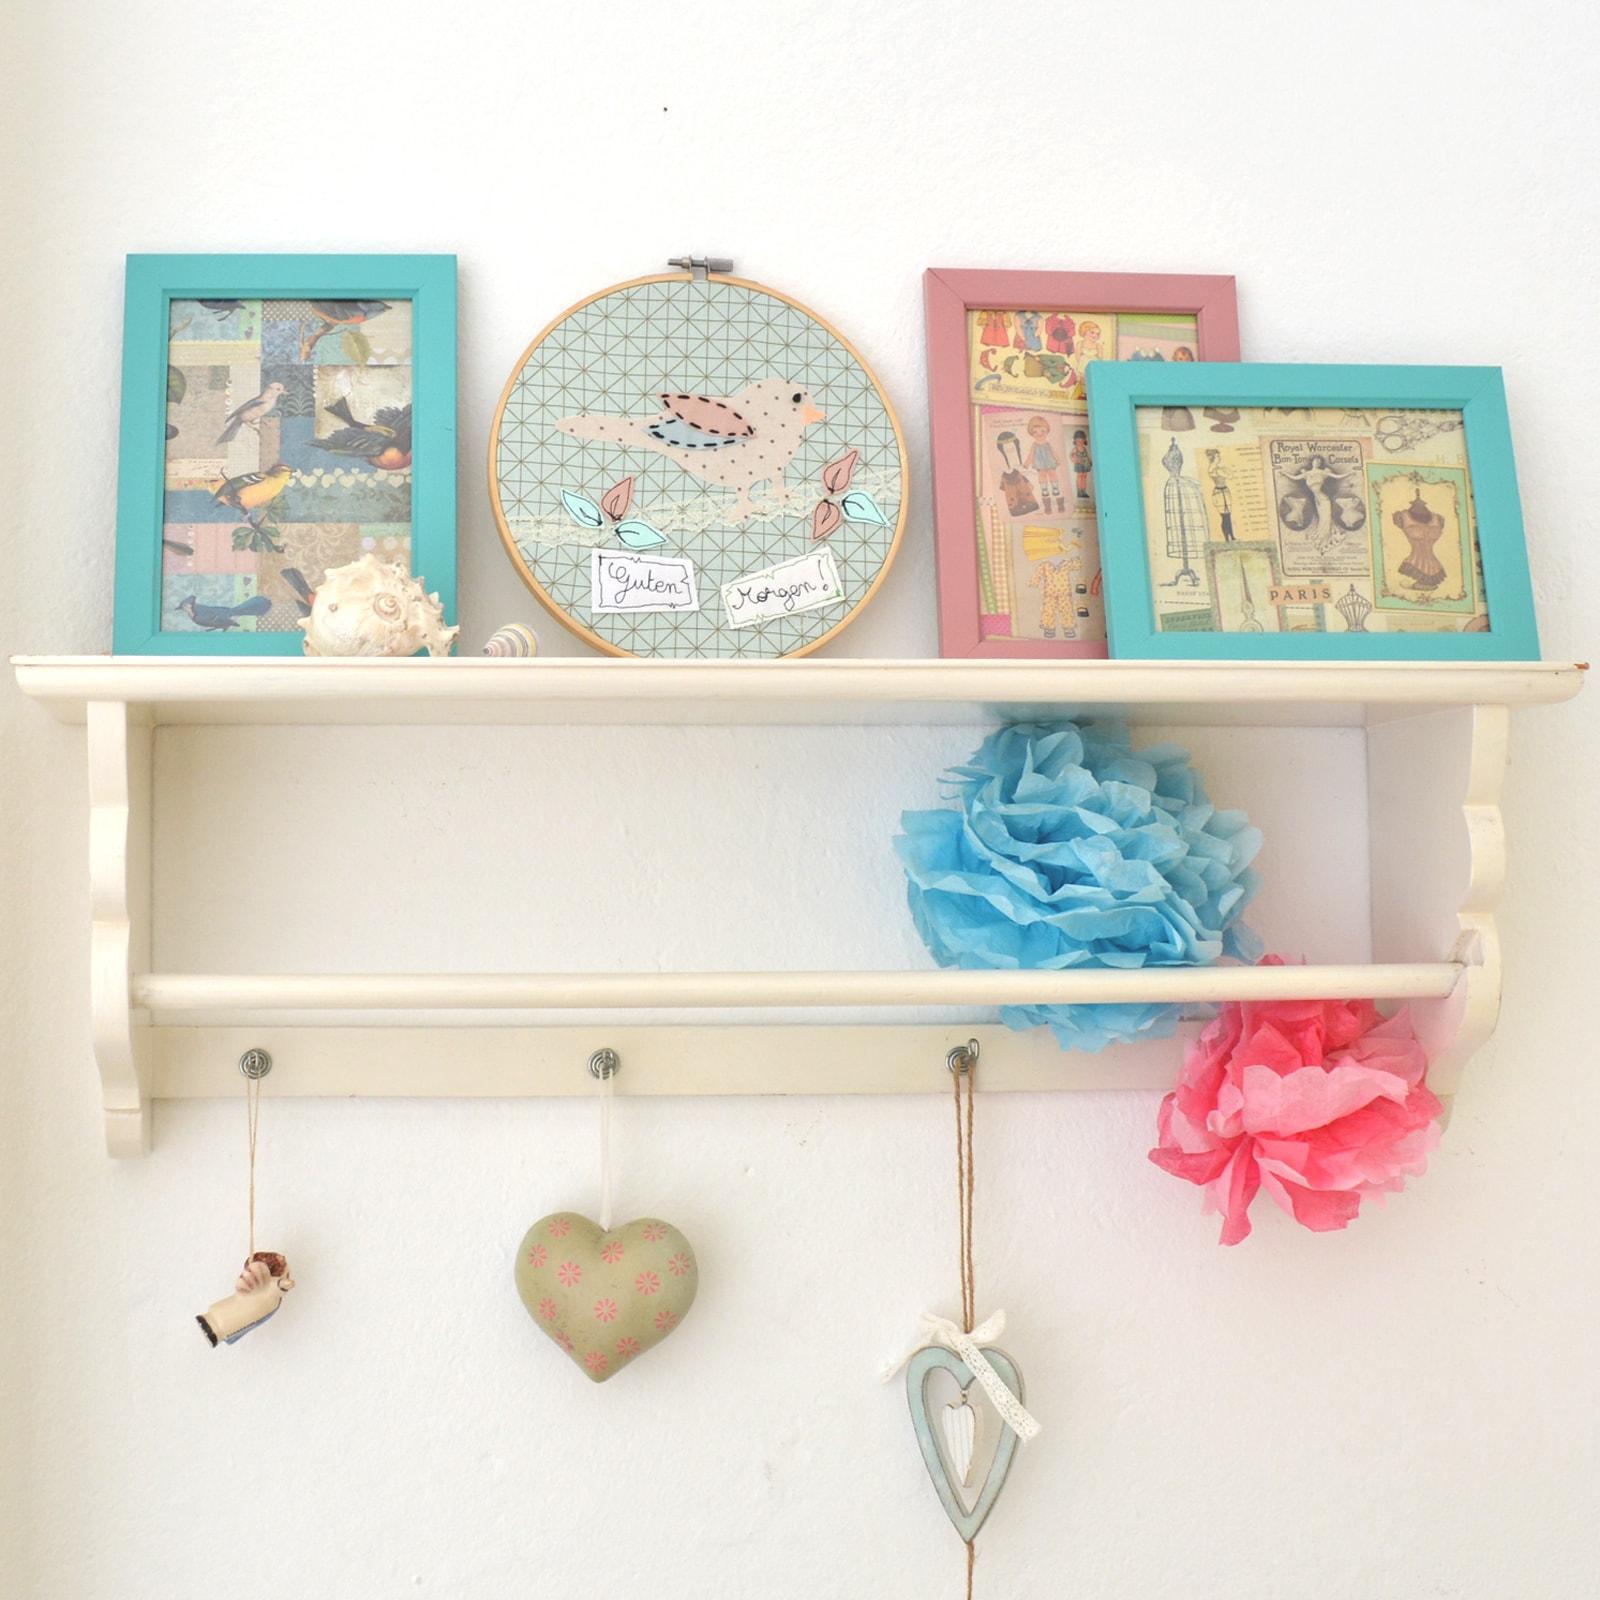 bastelpaket stickrahmen babyzimmer deko ilma pallo diy kits diy kits zu den themen. Black Bedroom Furniture Sets. Home Design Ideas